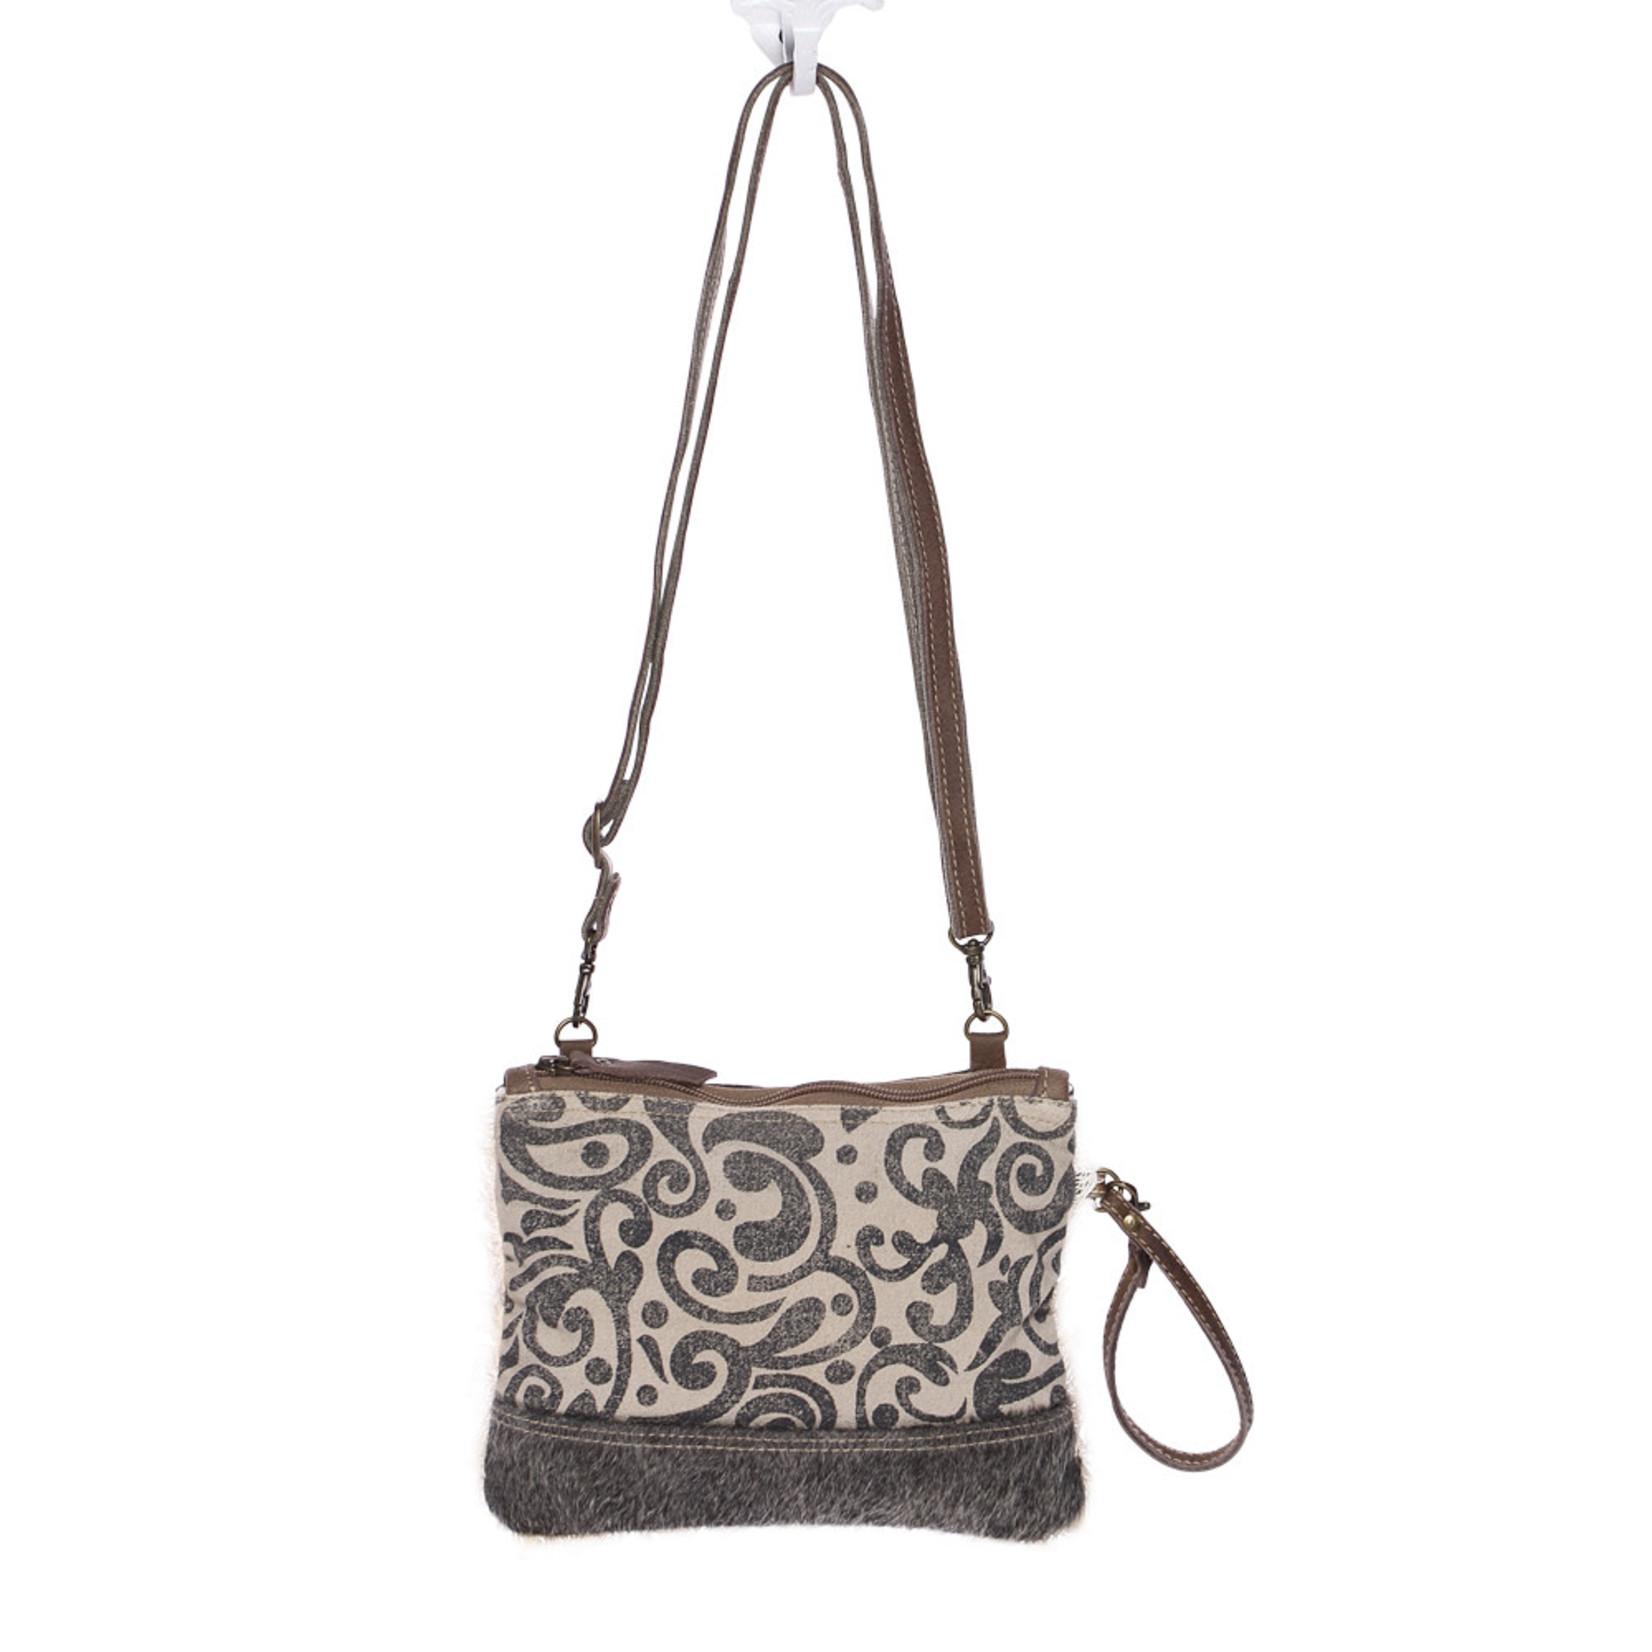 Myra Bags S-1150 Dual Strap Small & Crossbody Bag